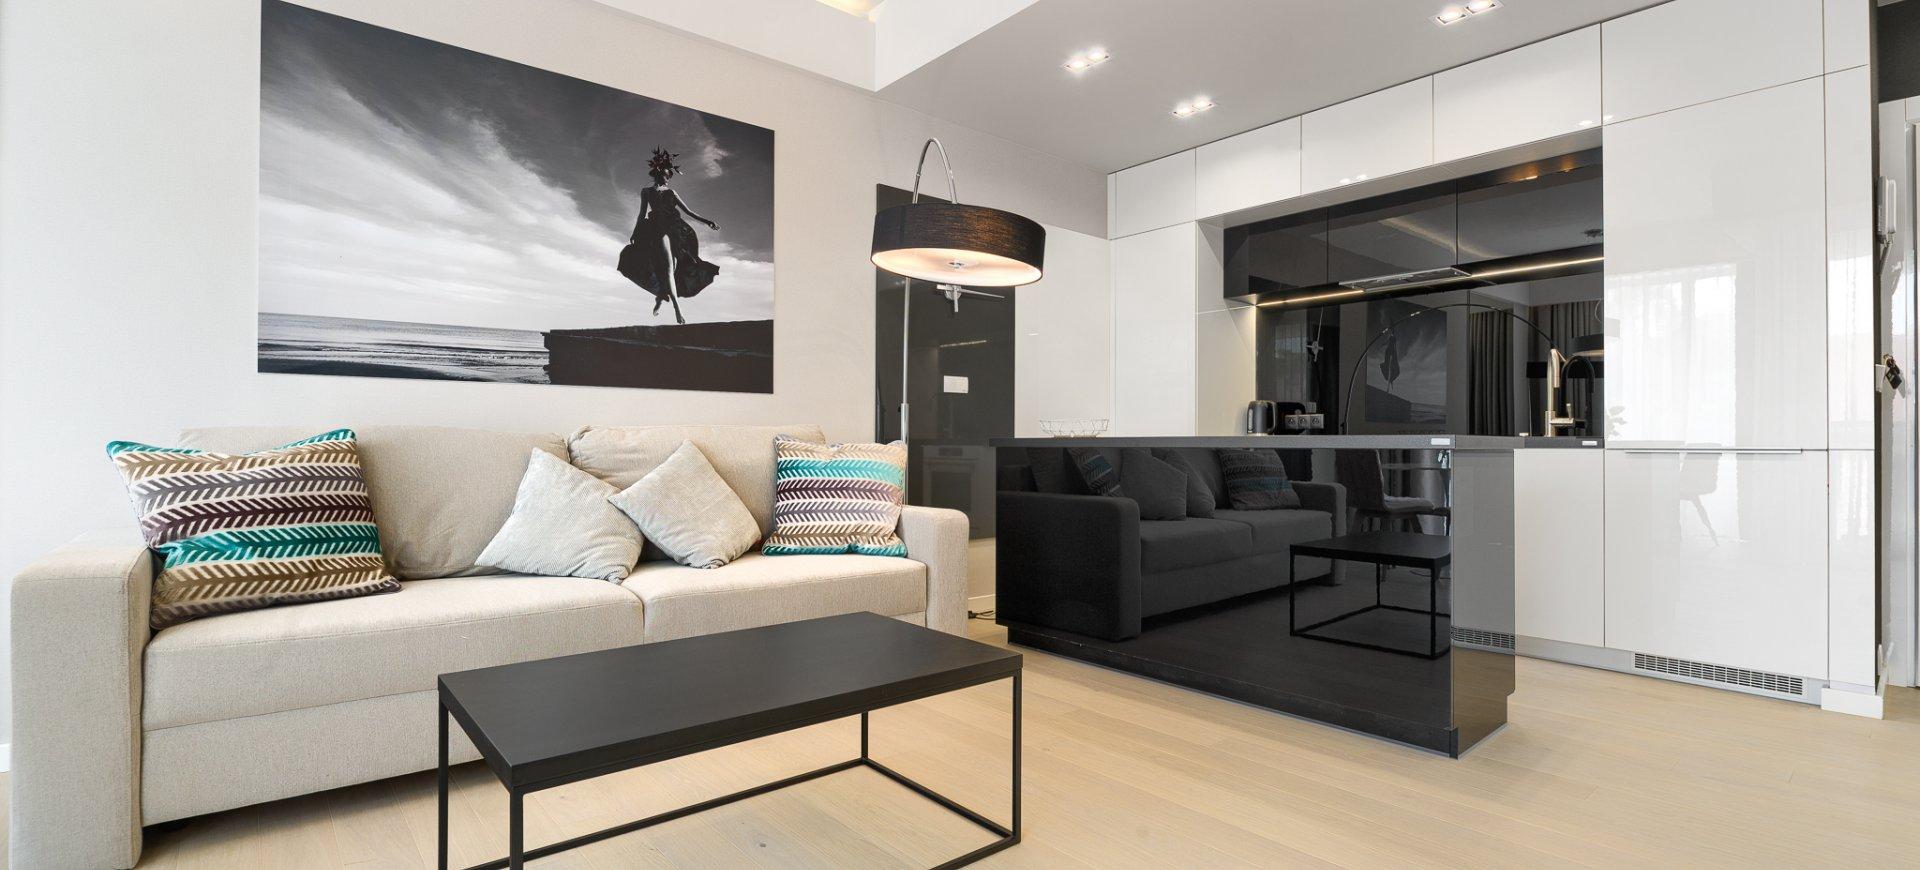 Apartament Deluxe z 1 sypialnią 2.05 C